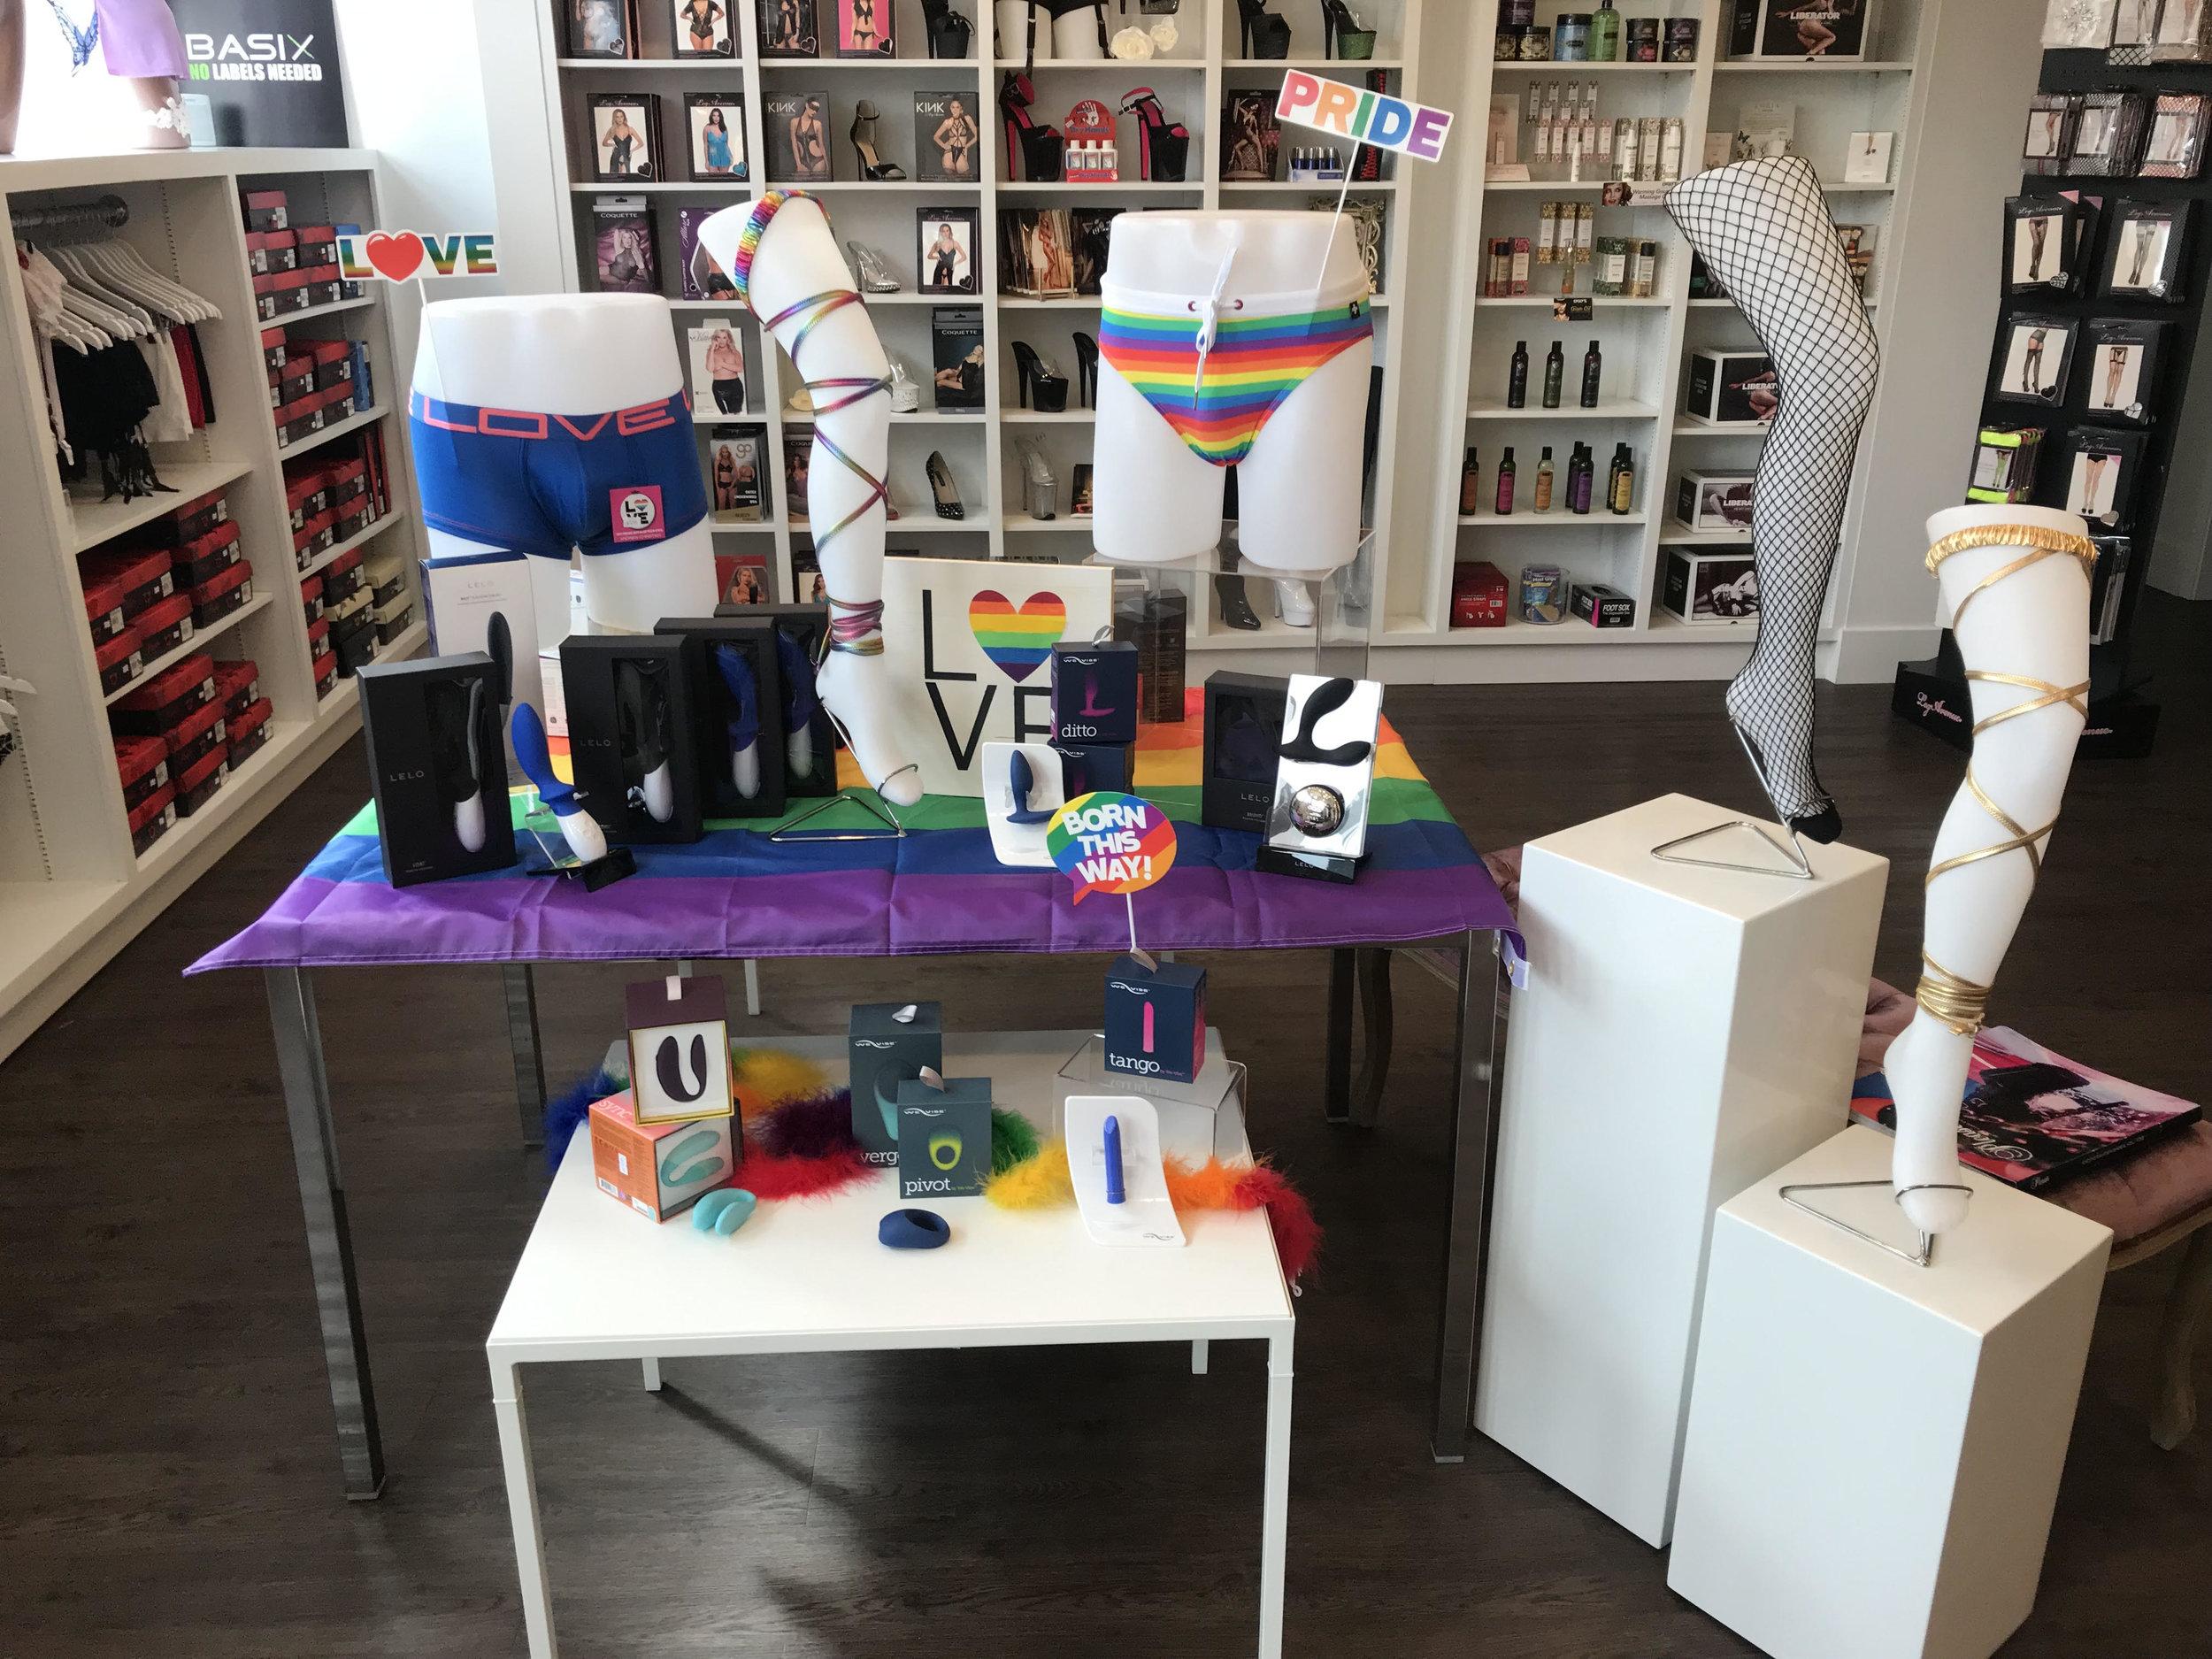 Hush-boutique-Adult Store-Calgary-003.jpg